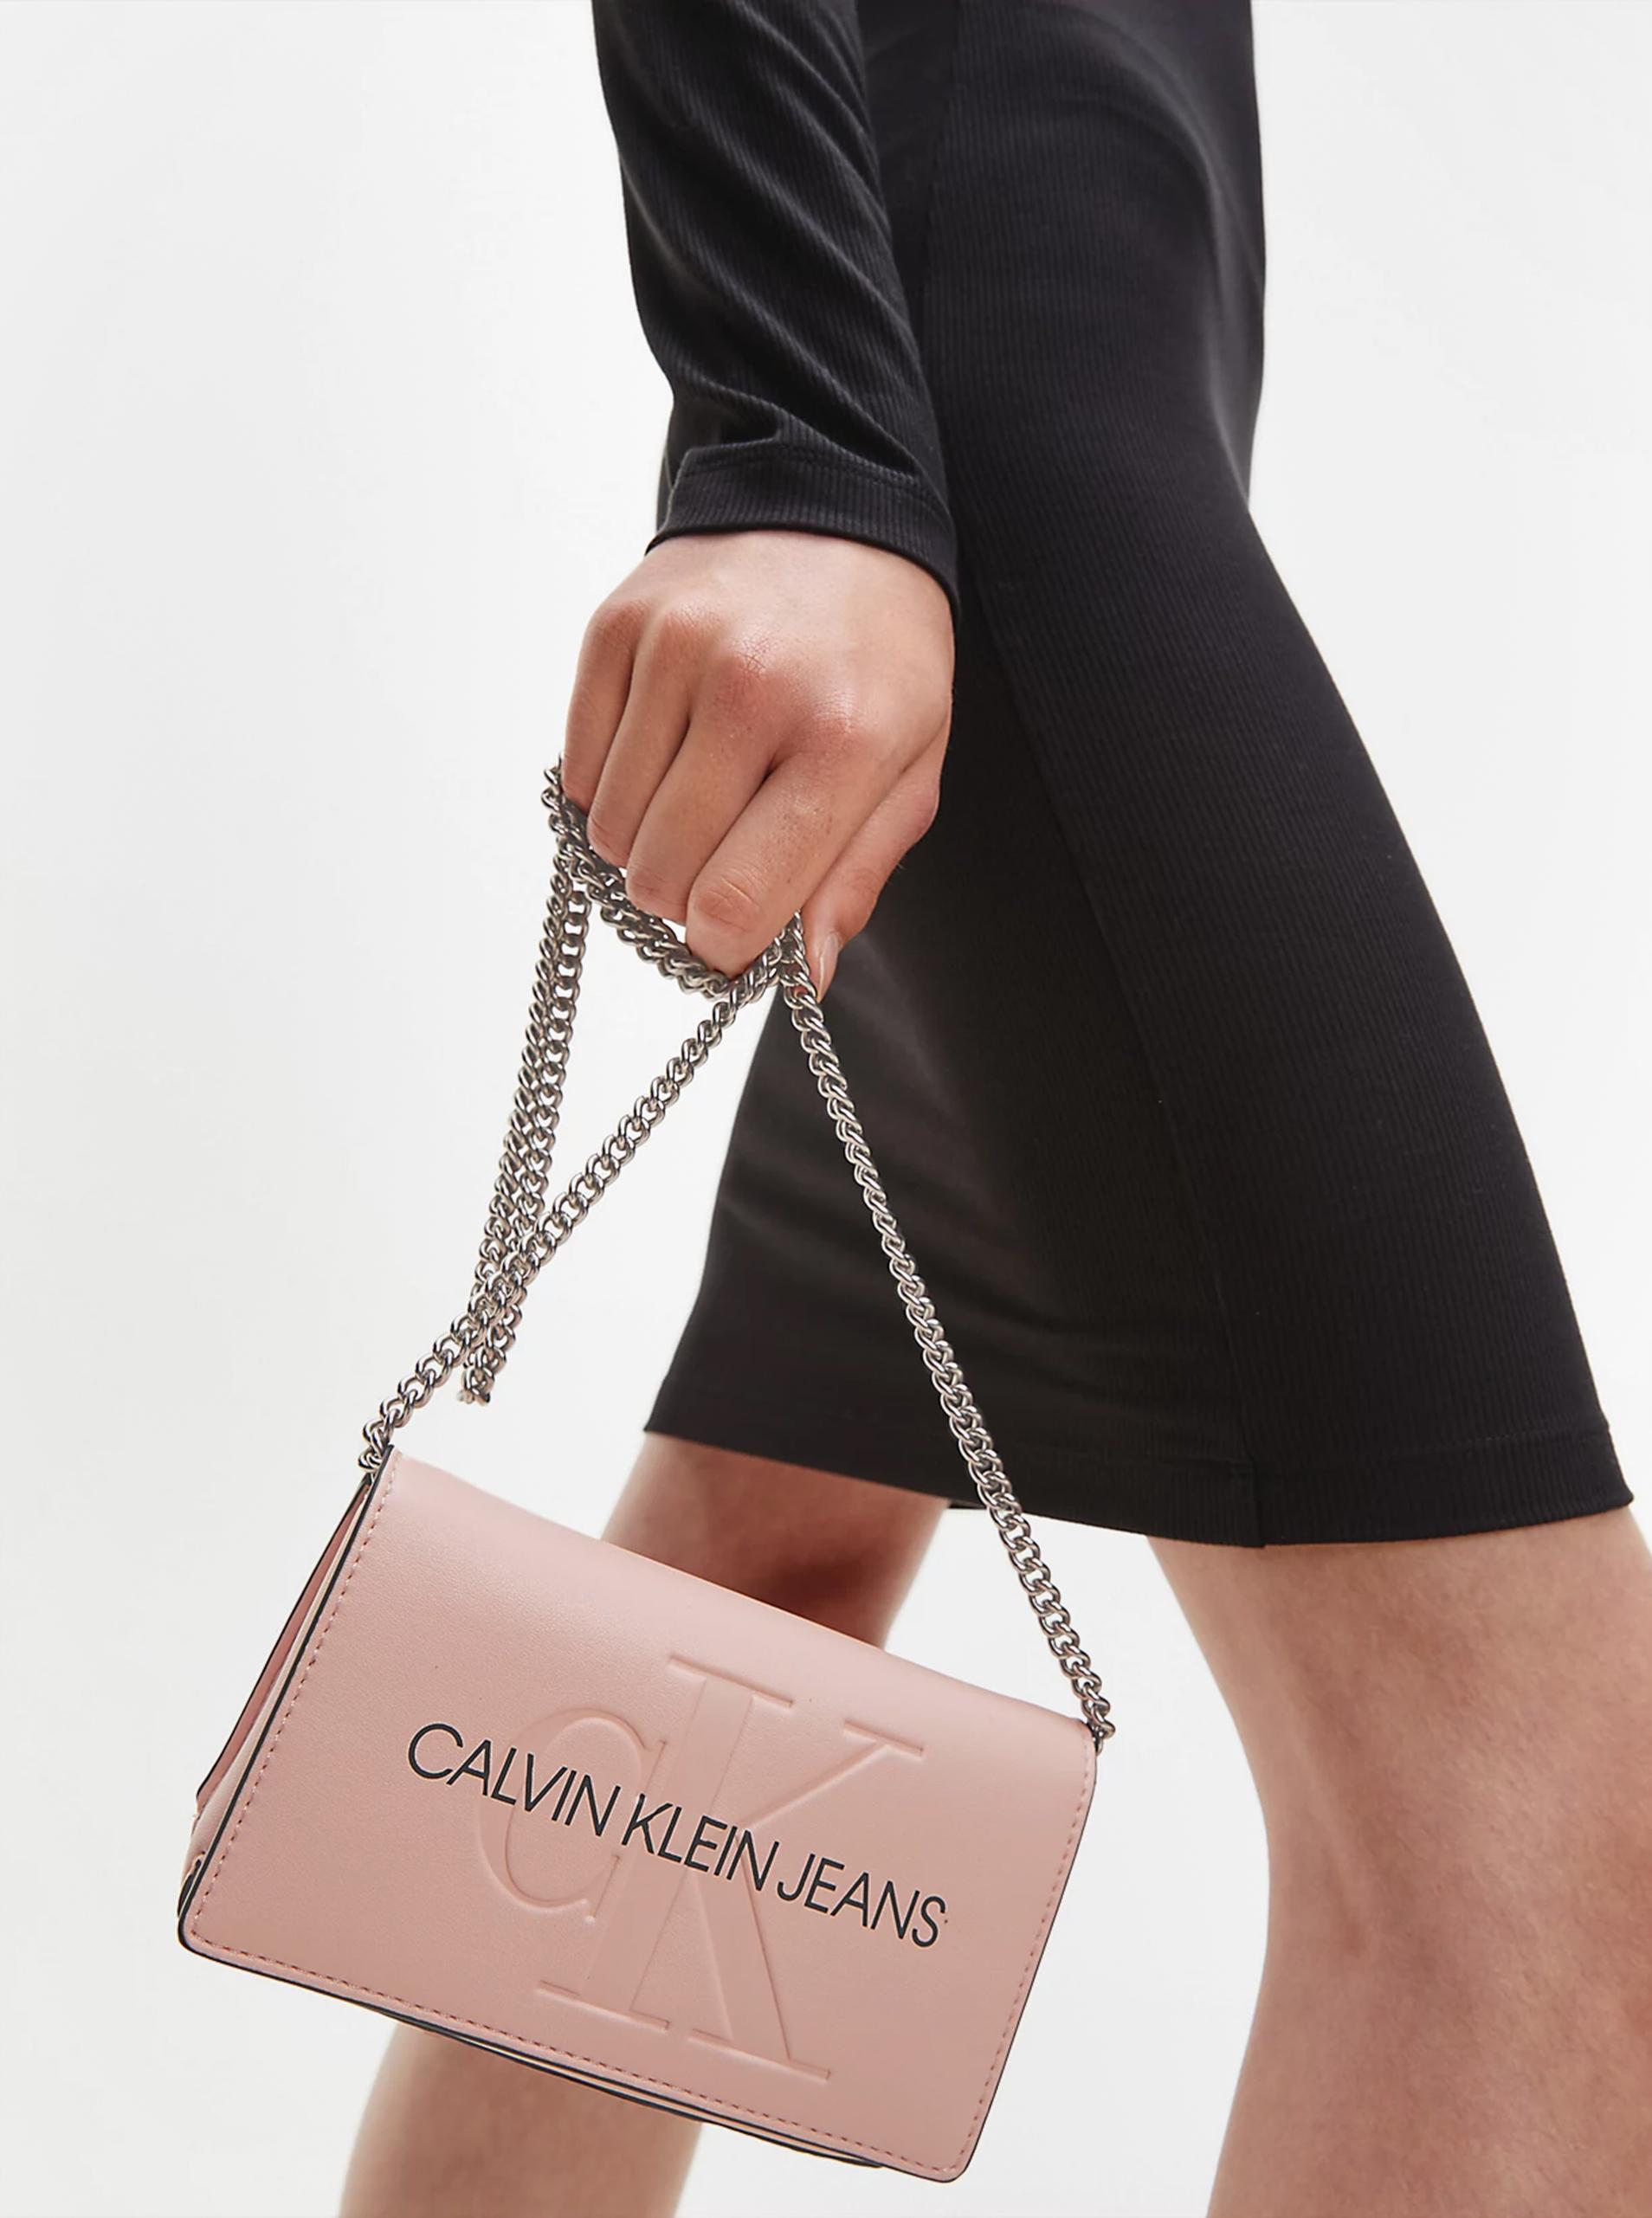 Calvin Klein pink crossbody handbag